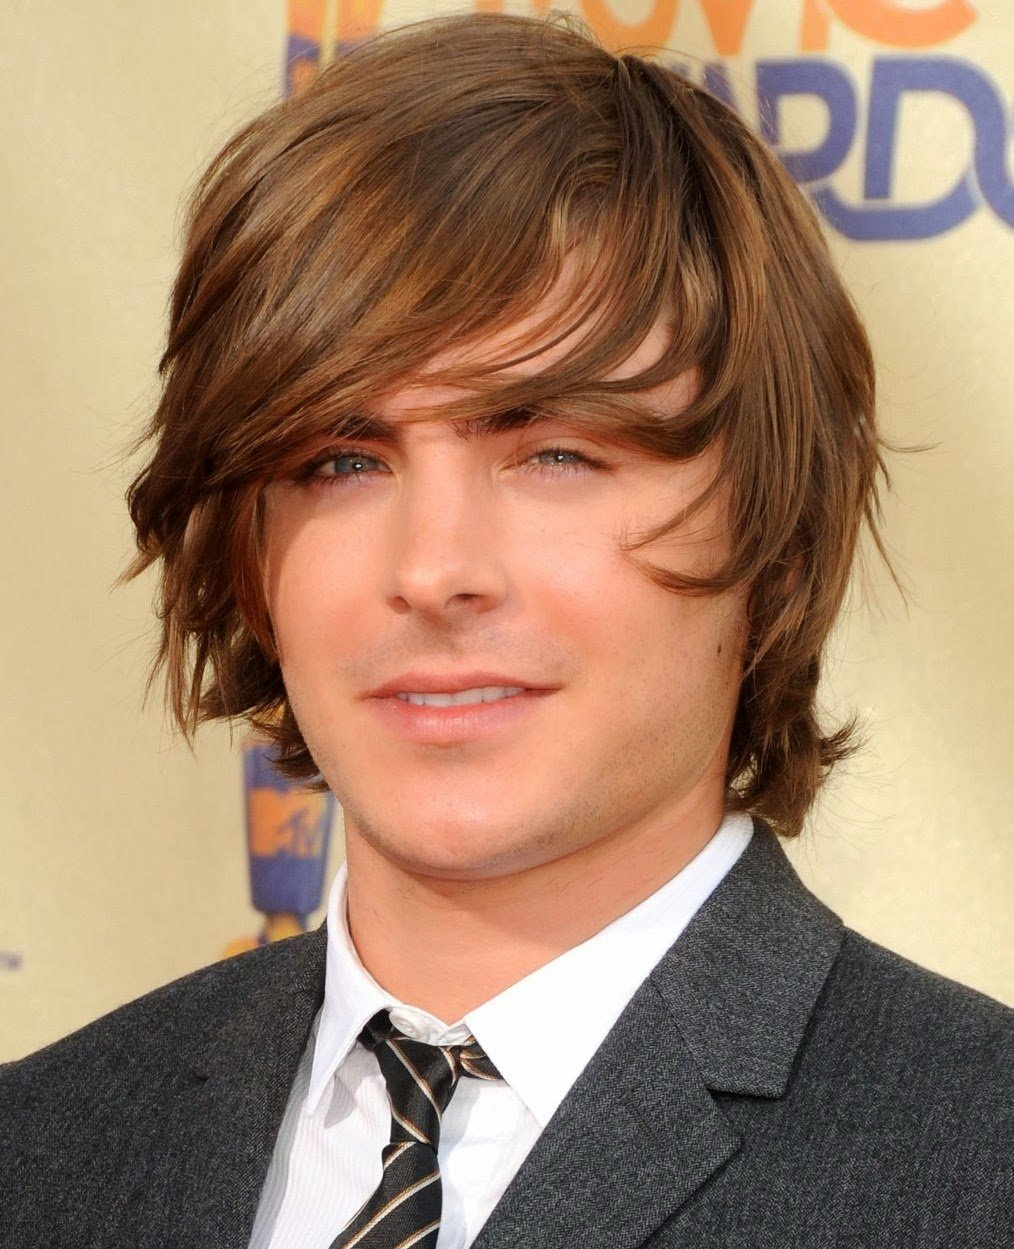 Фото мужские причёсок на средние волосы с чёлкой фото